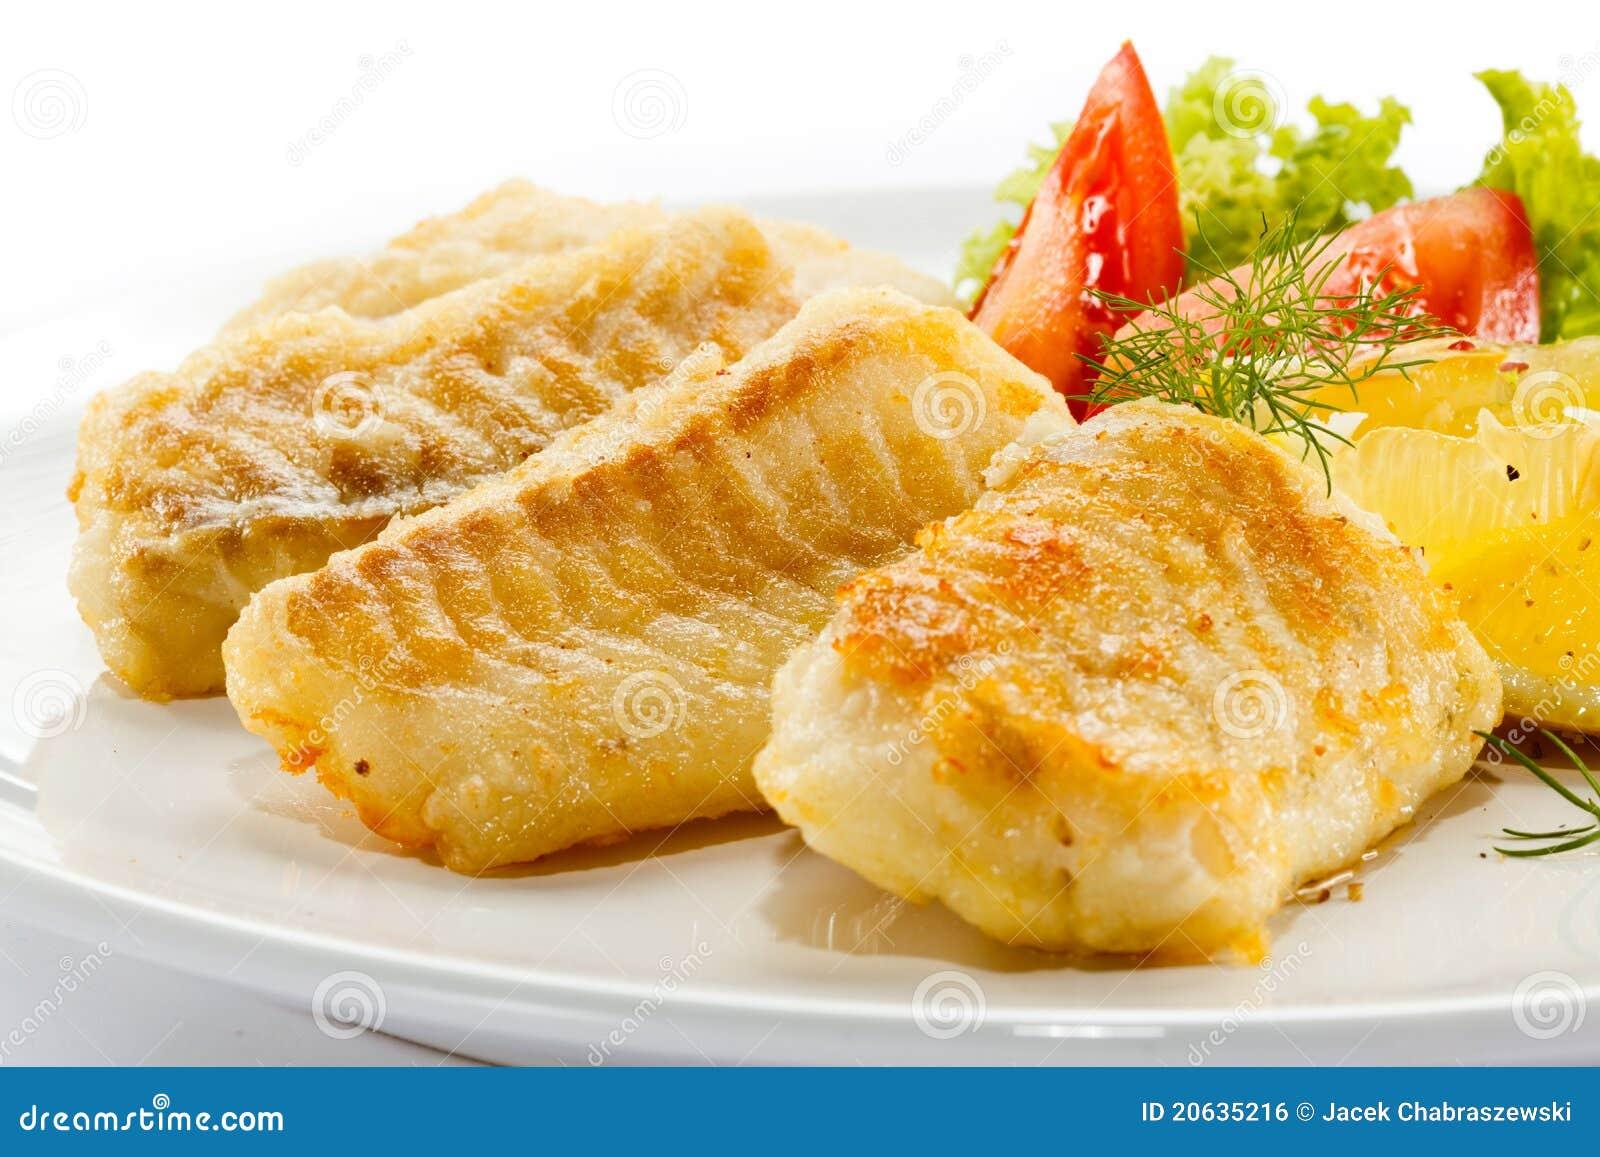 Fried fish fillet royalty free stock image image 20635216 for Fried fish fillet